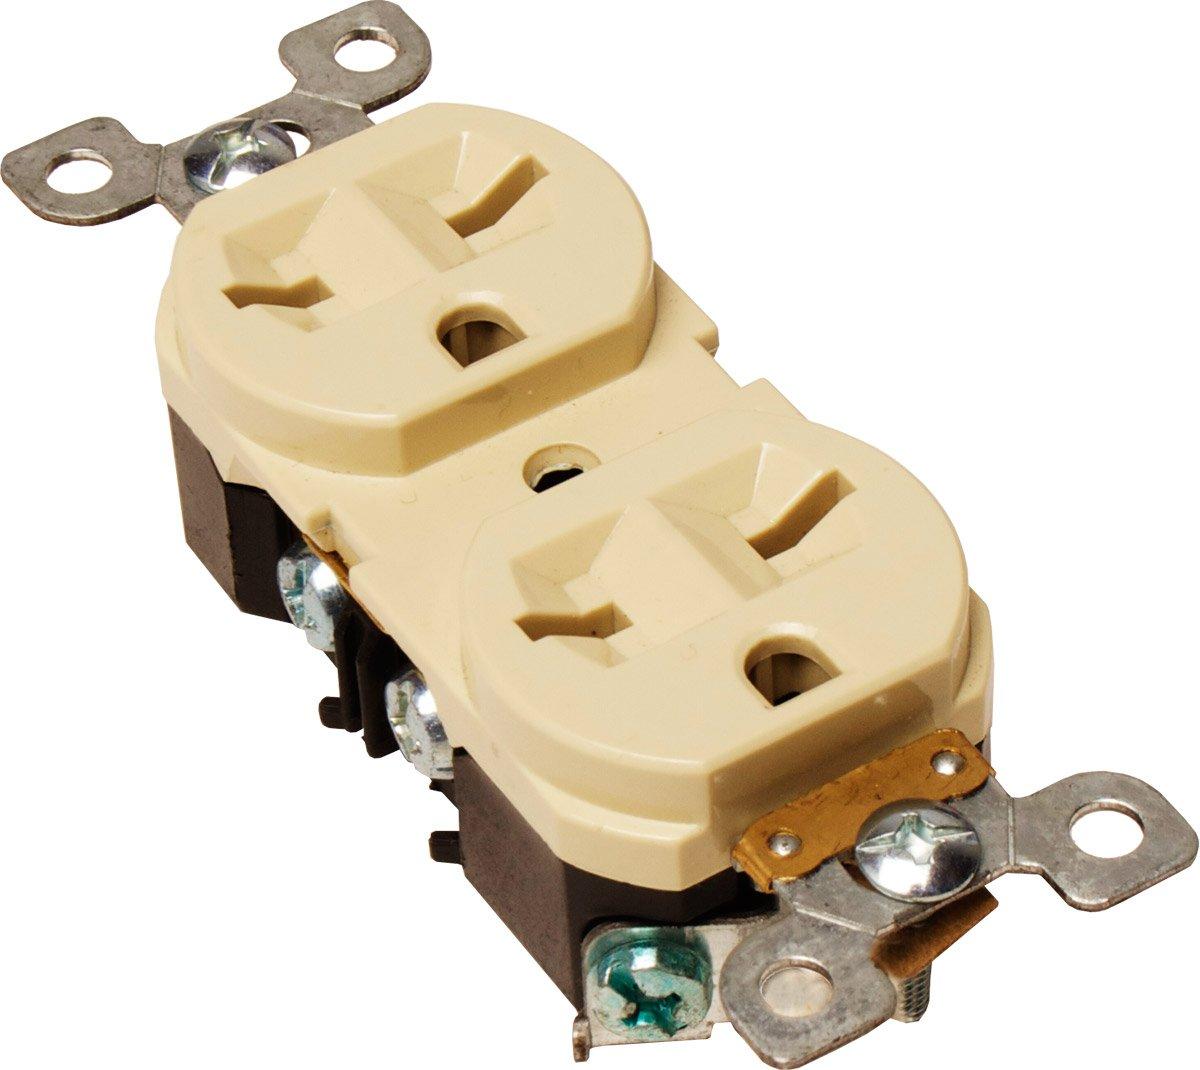 Hydrofarm 15 Amp Duplex Receptacle 240 Volt 250 Plug Wiring Electrical Outlets Garden Outdoor